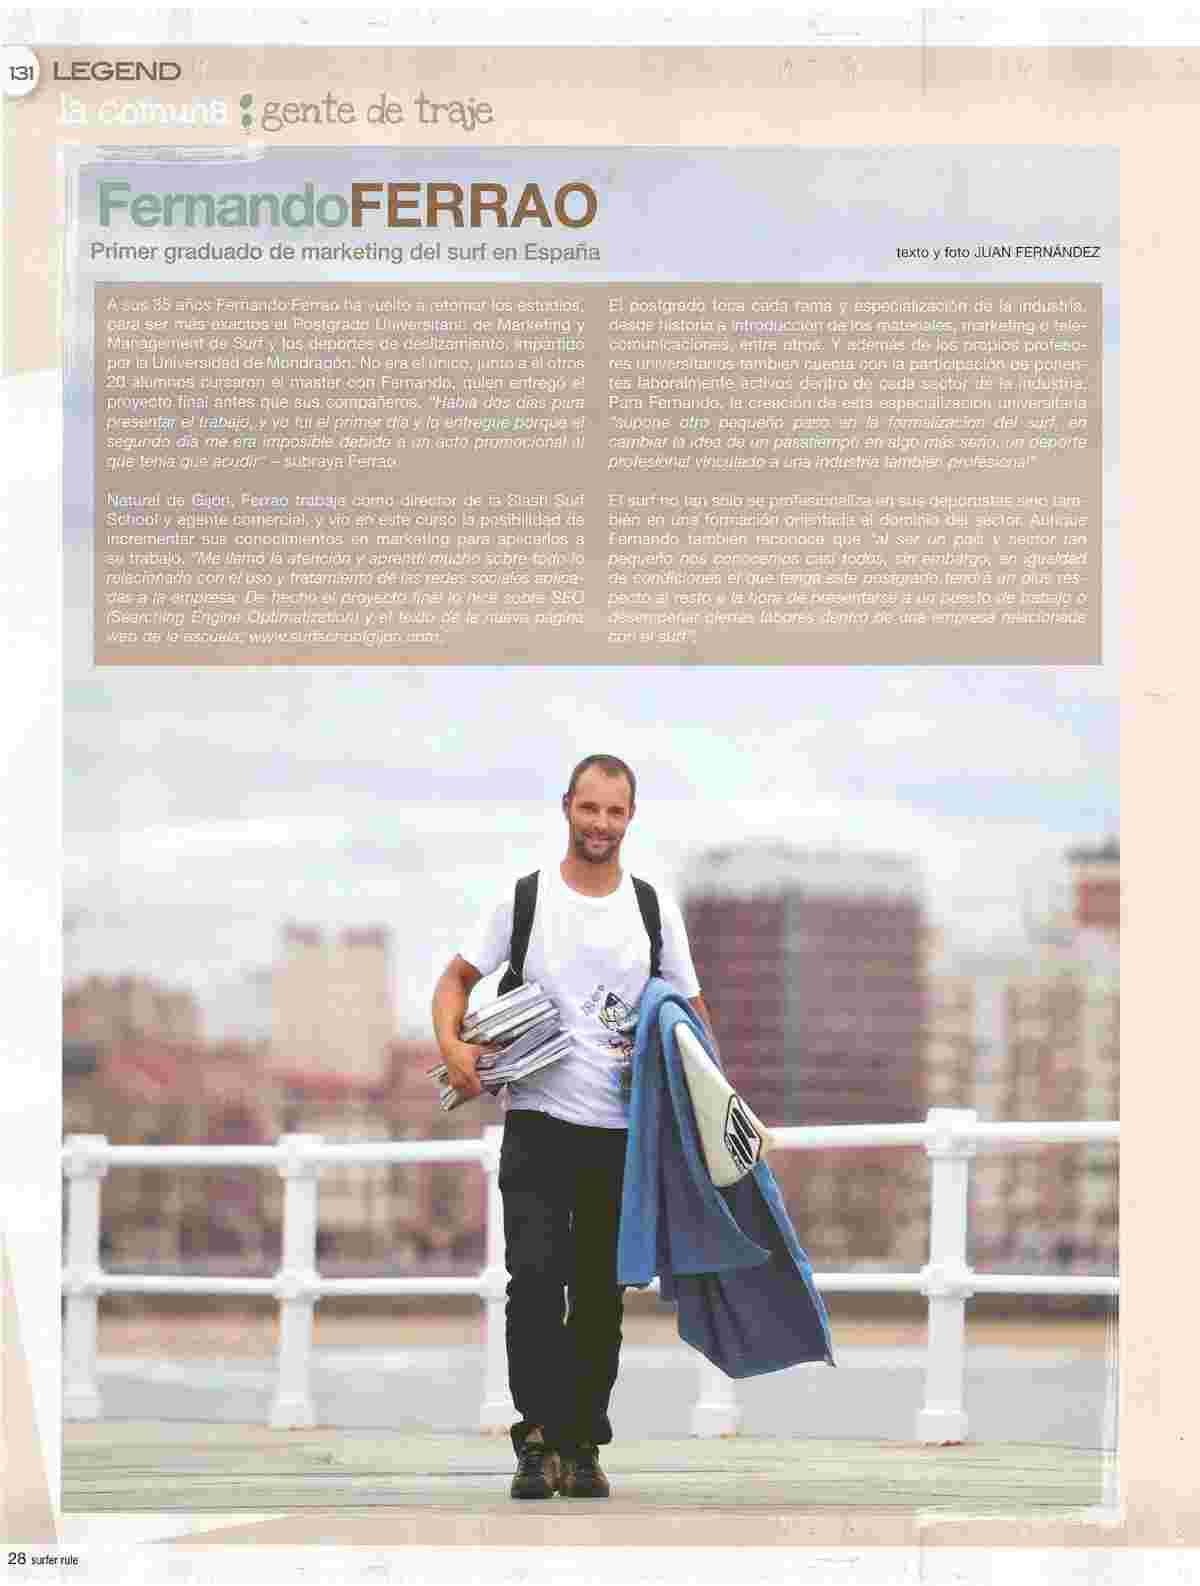 Fernando Ferrao